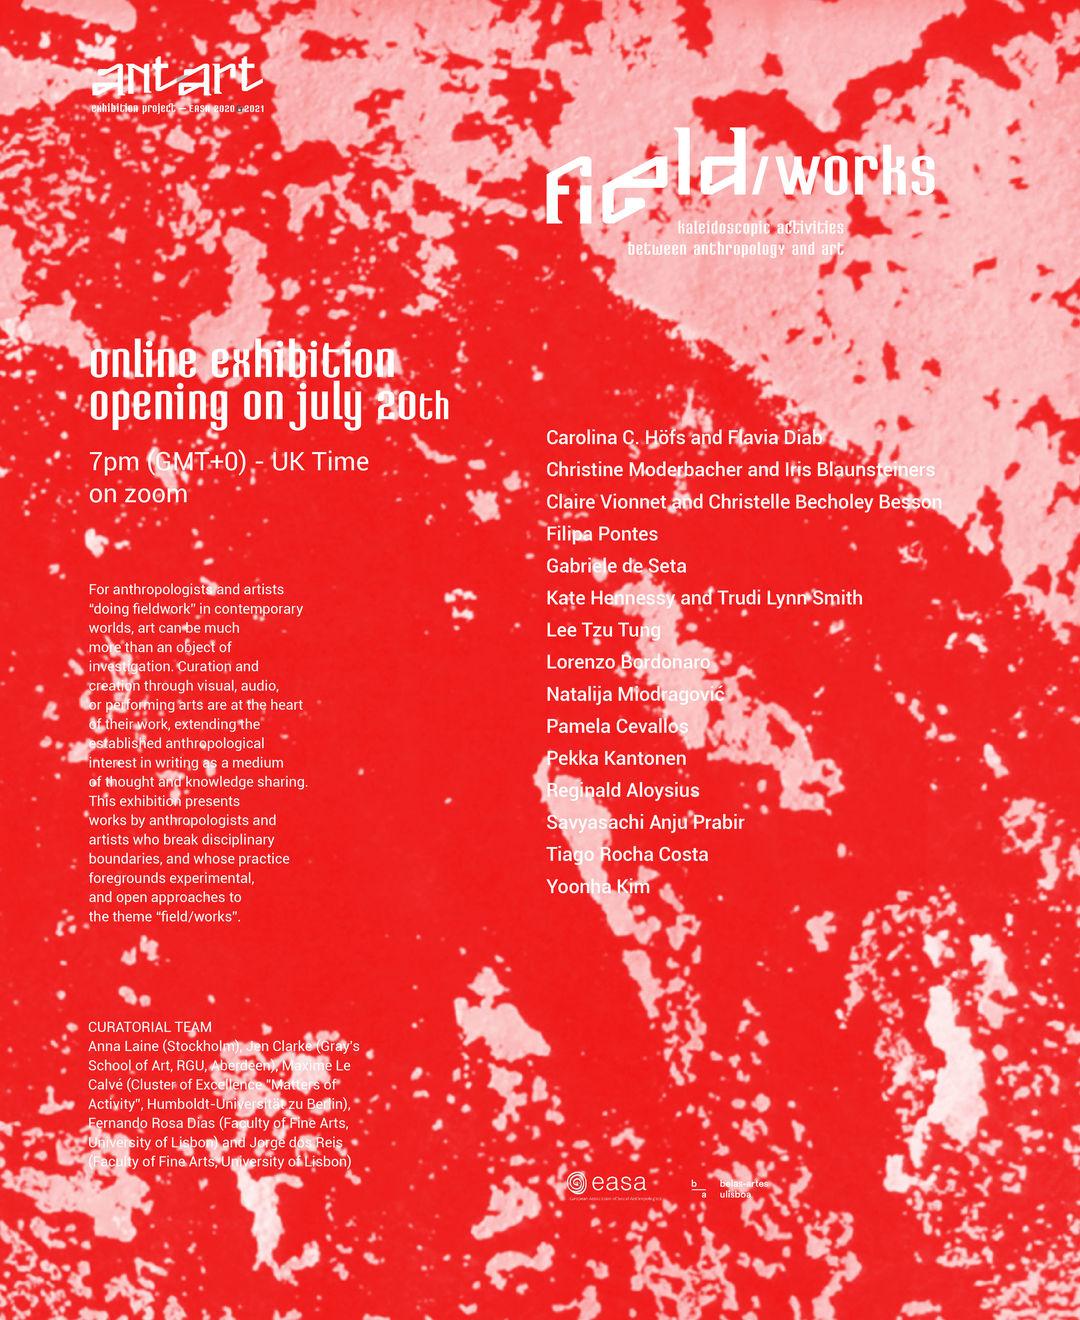 Poster »Field/Works«. Copyright: Antart